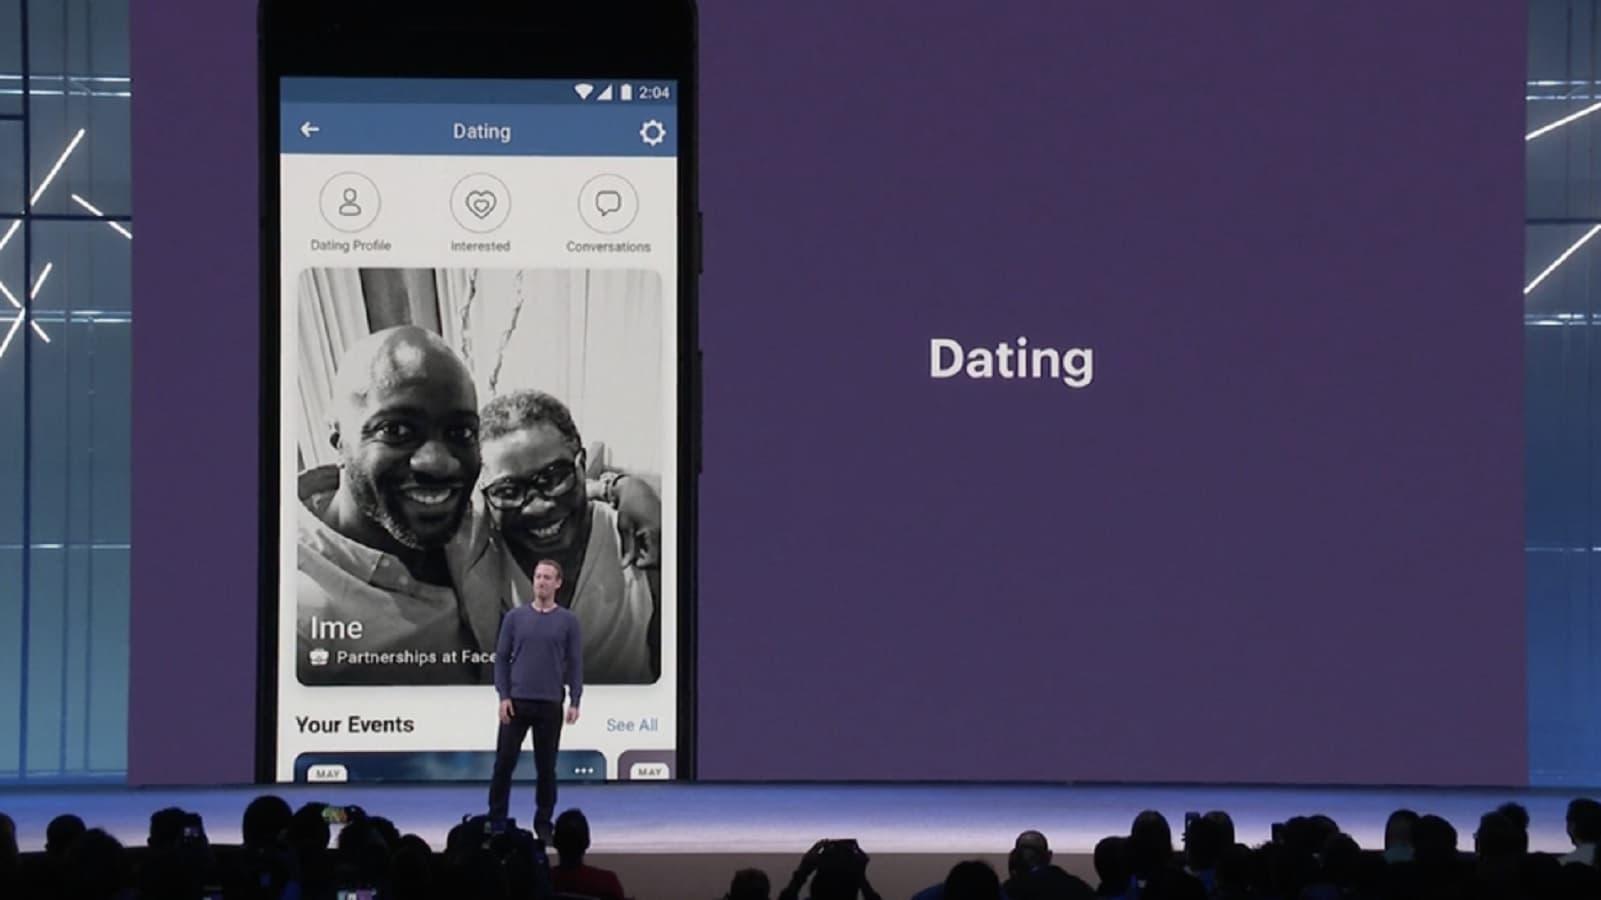 facebook dating secret crush with mark zuckerberg on stage